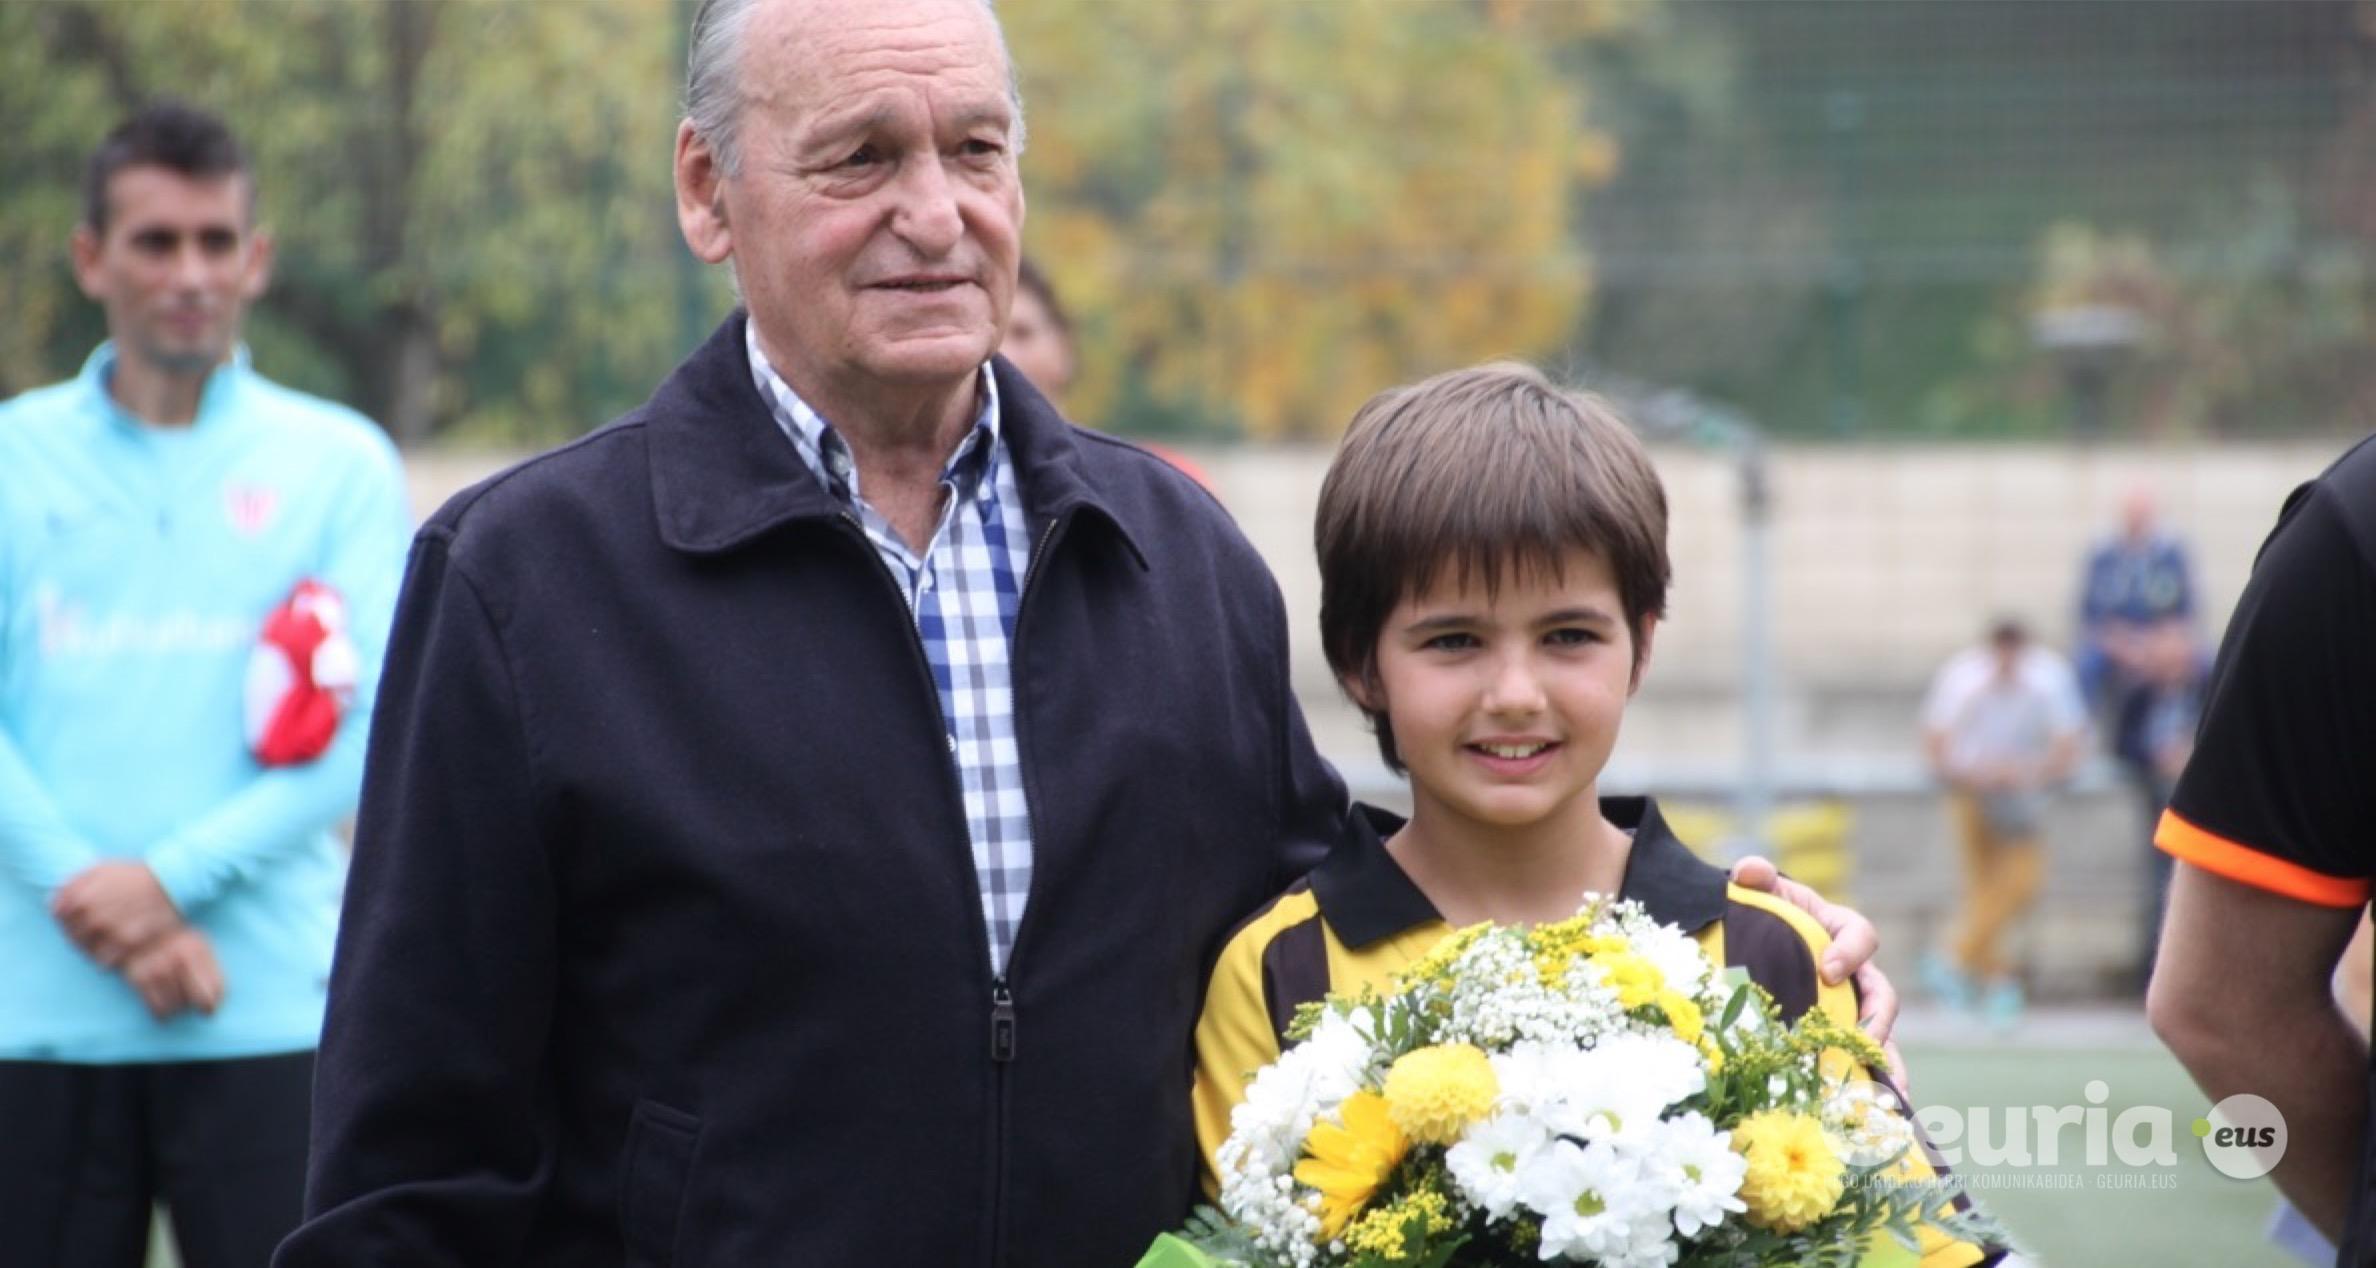 basauri_san_fausto_2015_futbol_basconia_beteranoak_27